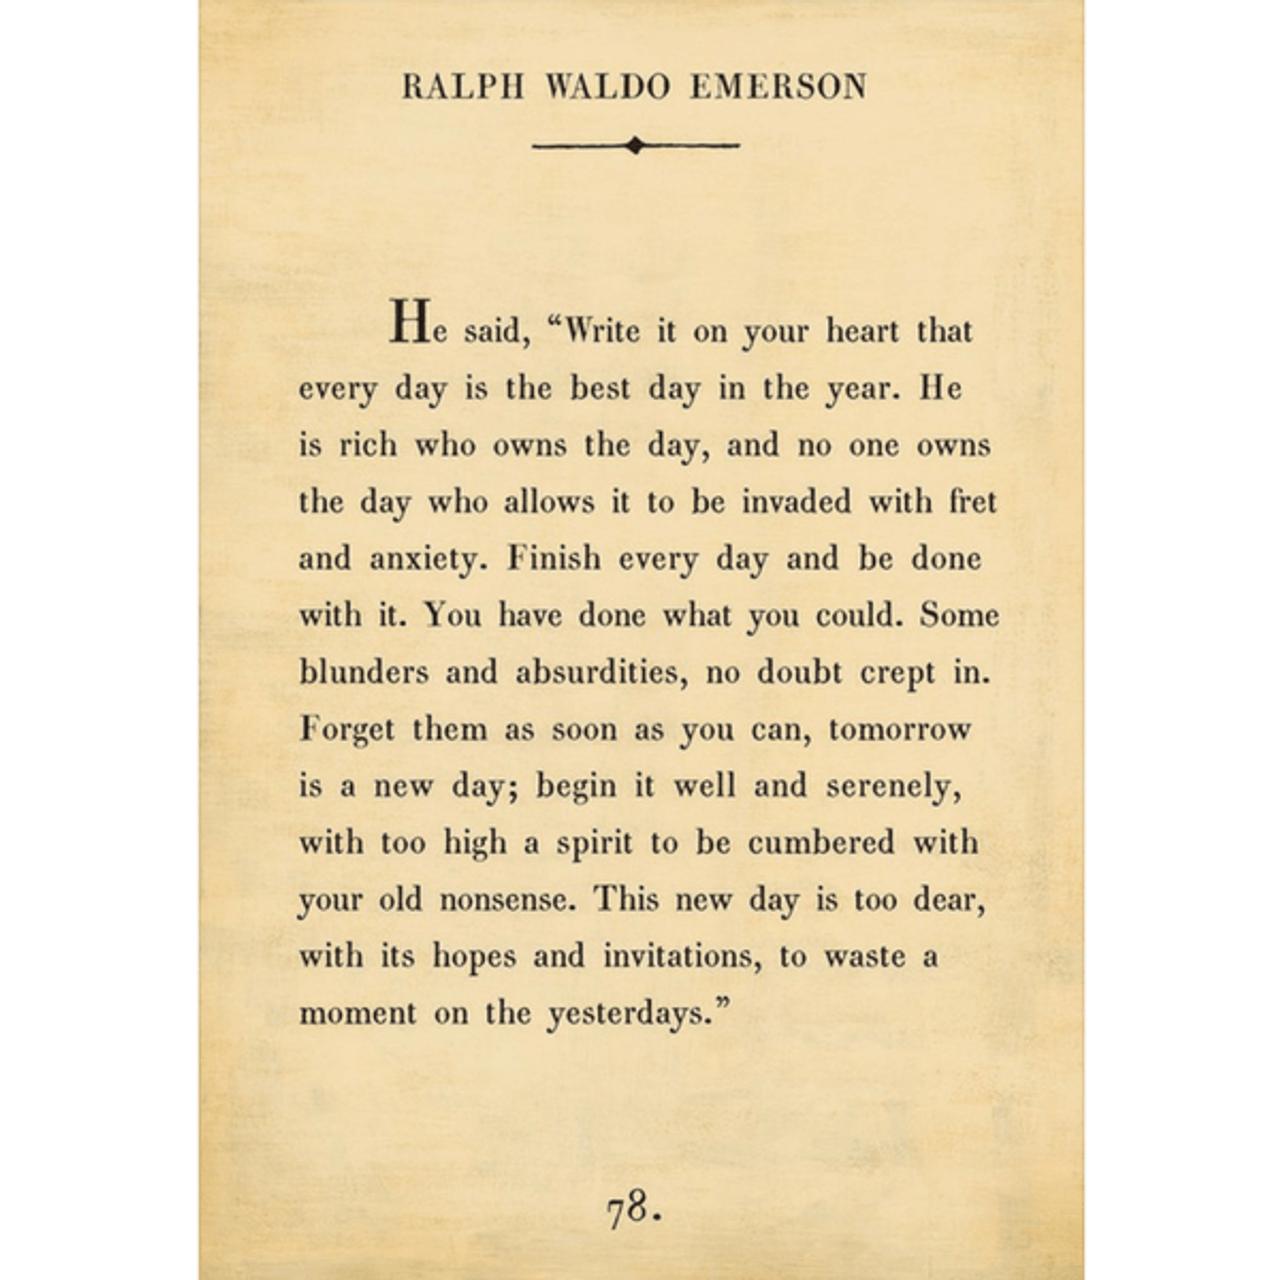 ralph waldo emerson art print - cream with gallery wrap frame